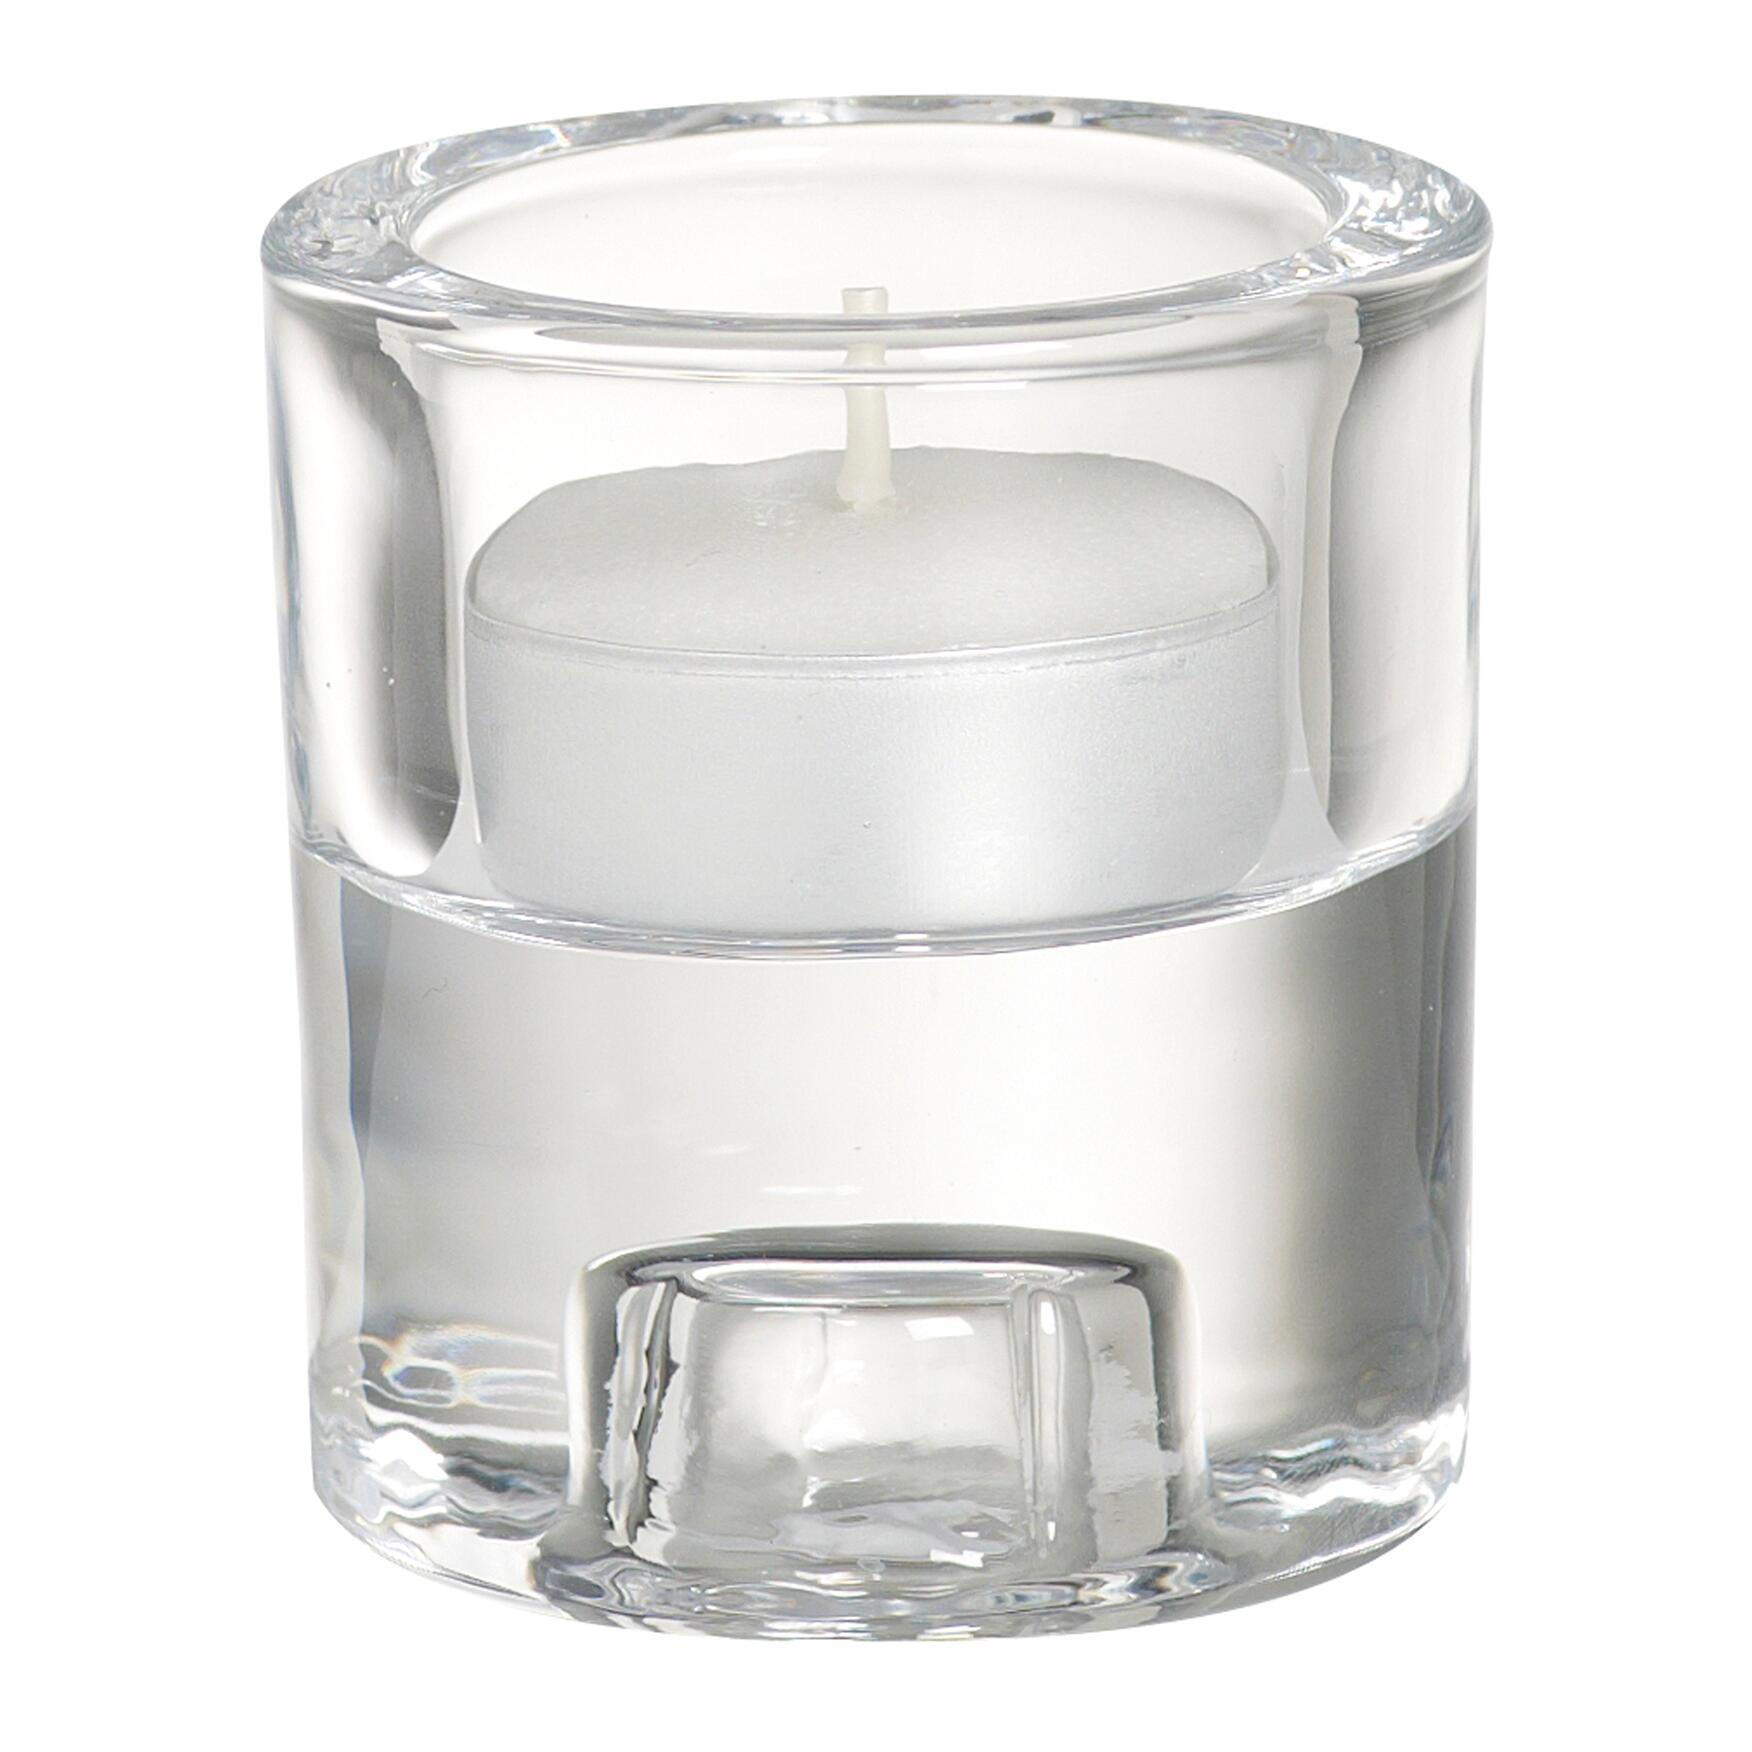 Porta tea light in vetro trasparente H 6 cm, L 6.5 x Ø 6.5 cm